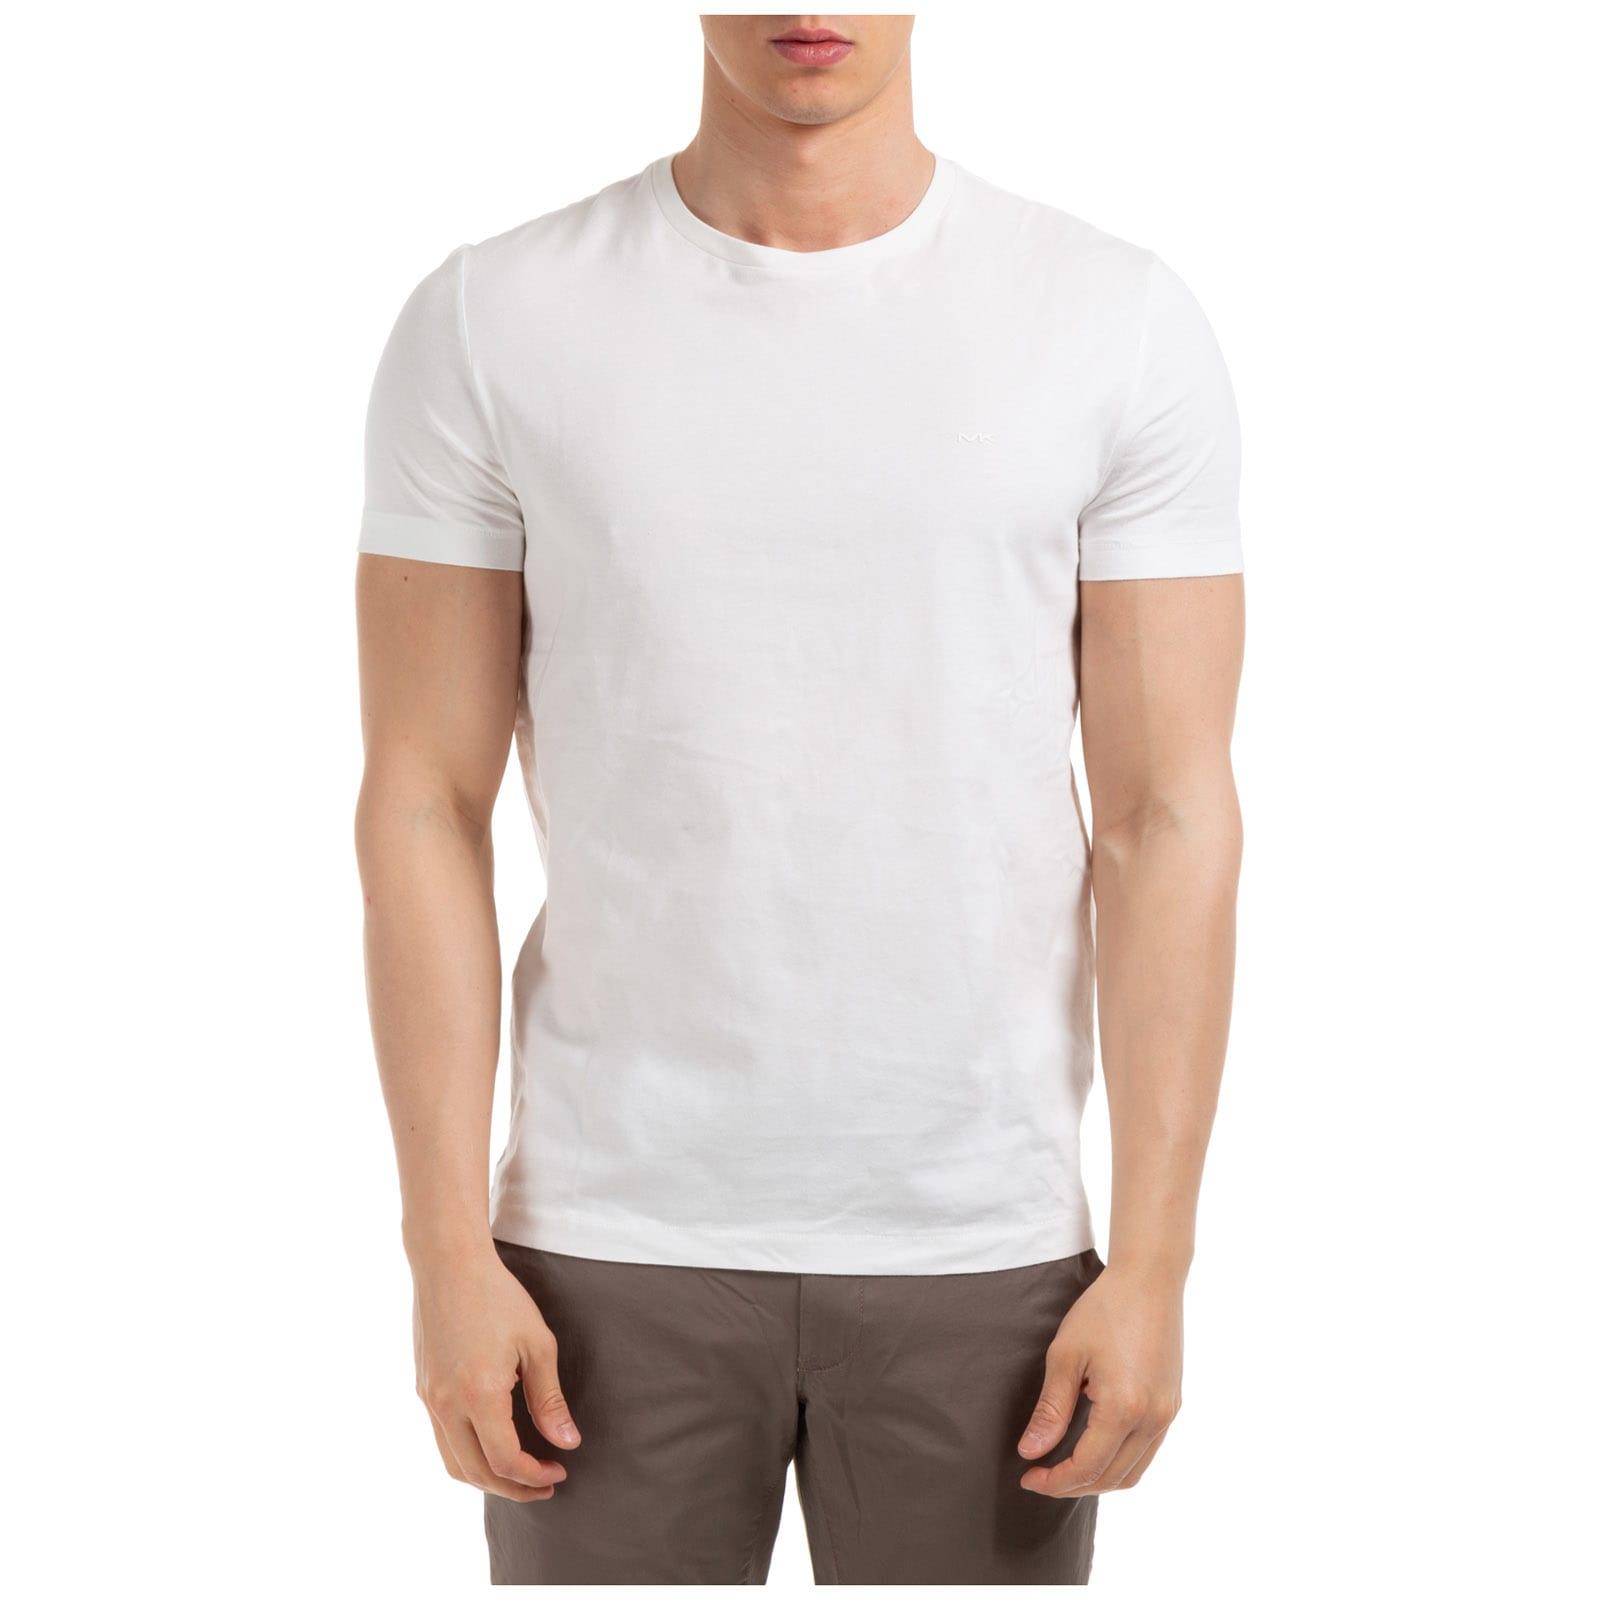 Michael Kors Resort T-shirt